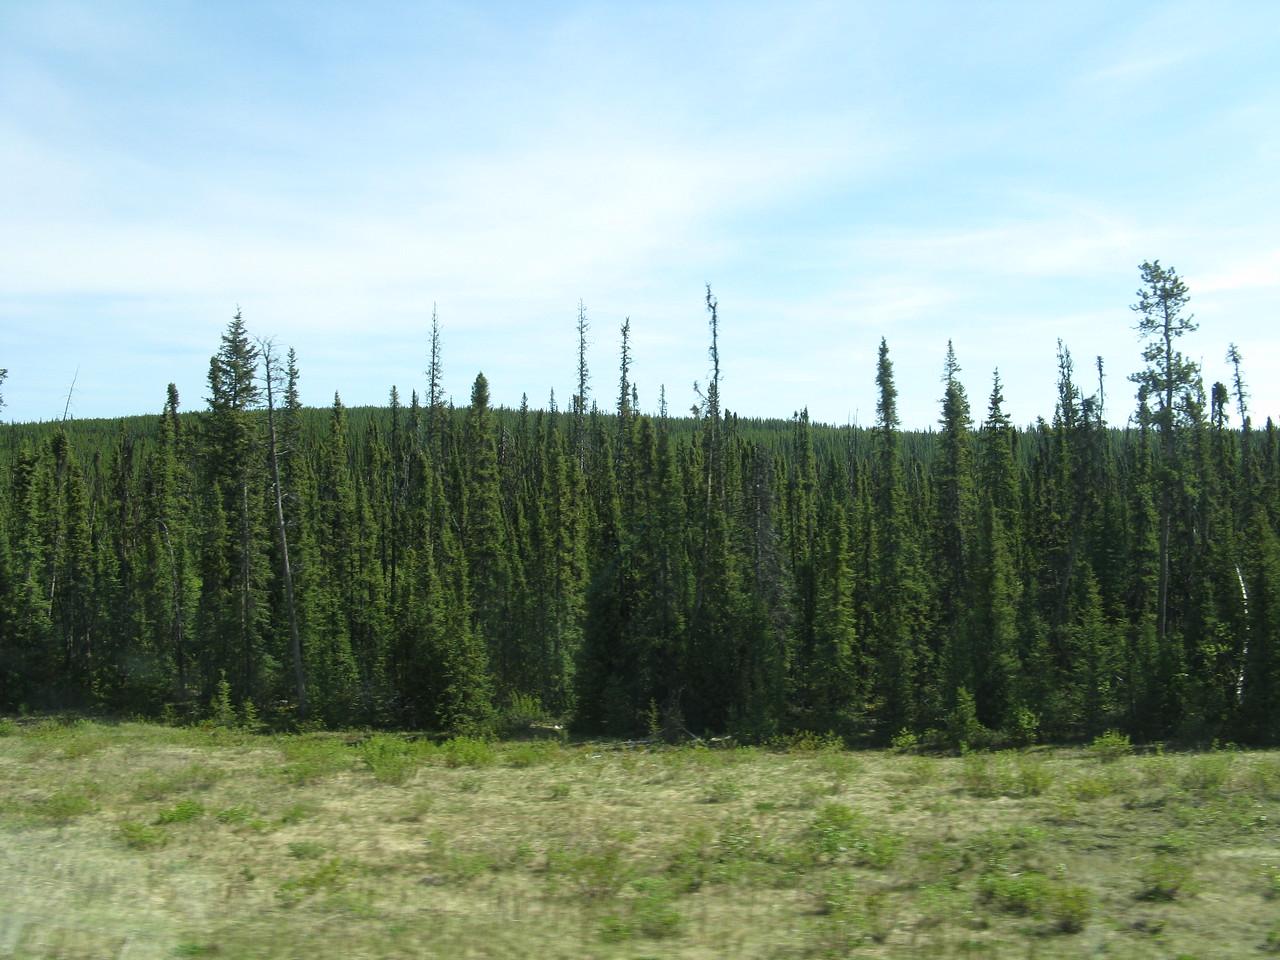 scrawny trees